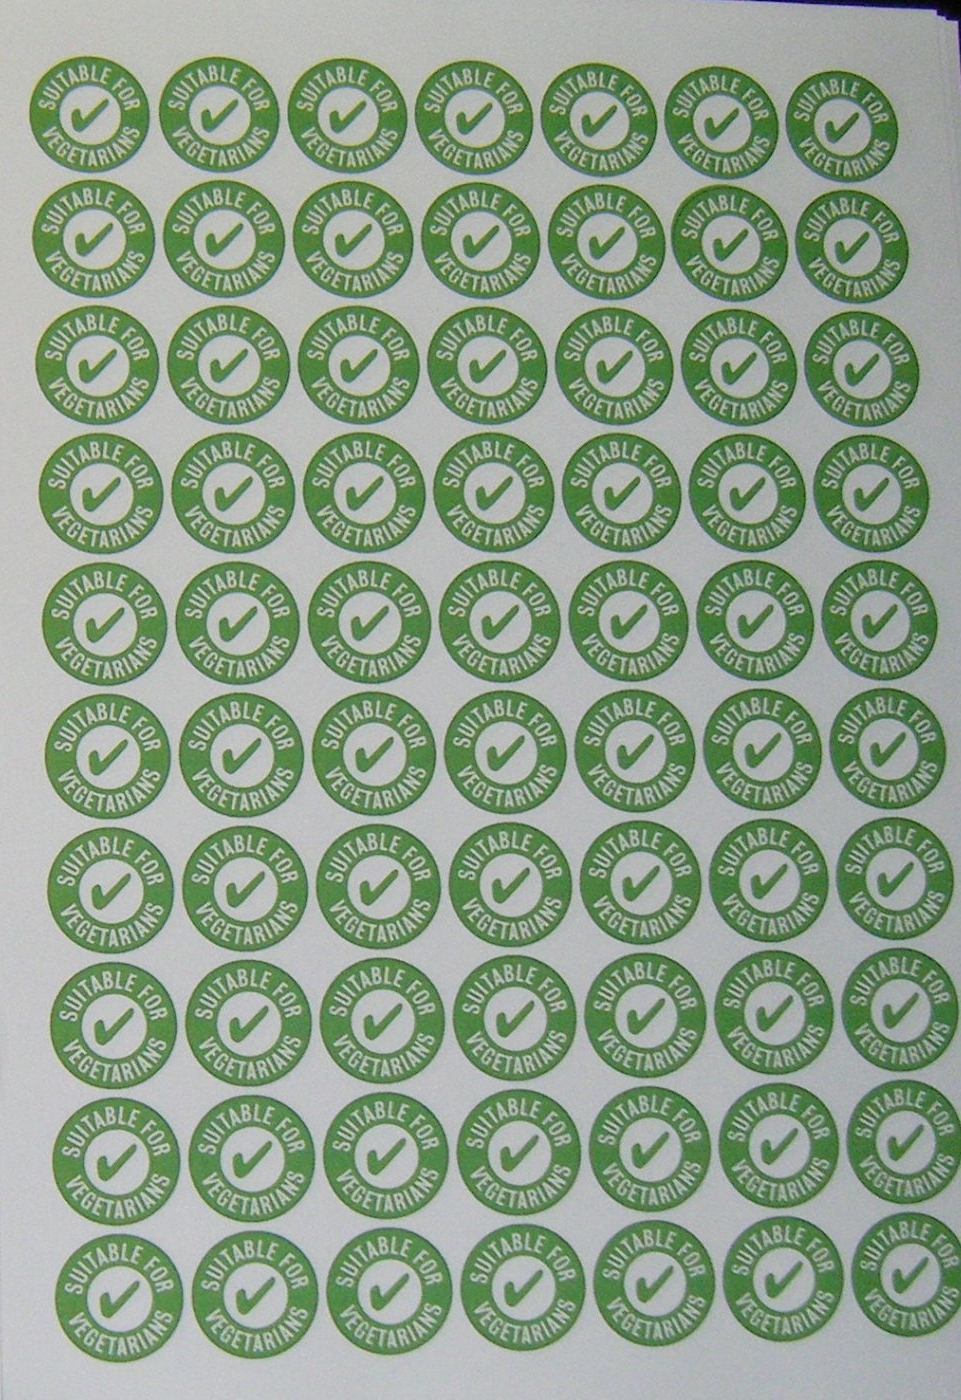 A4 Sheet of Vegetarian Stickers